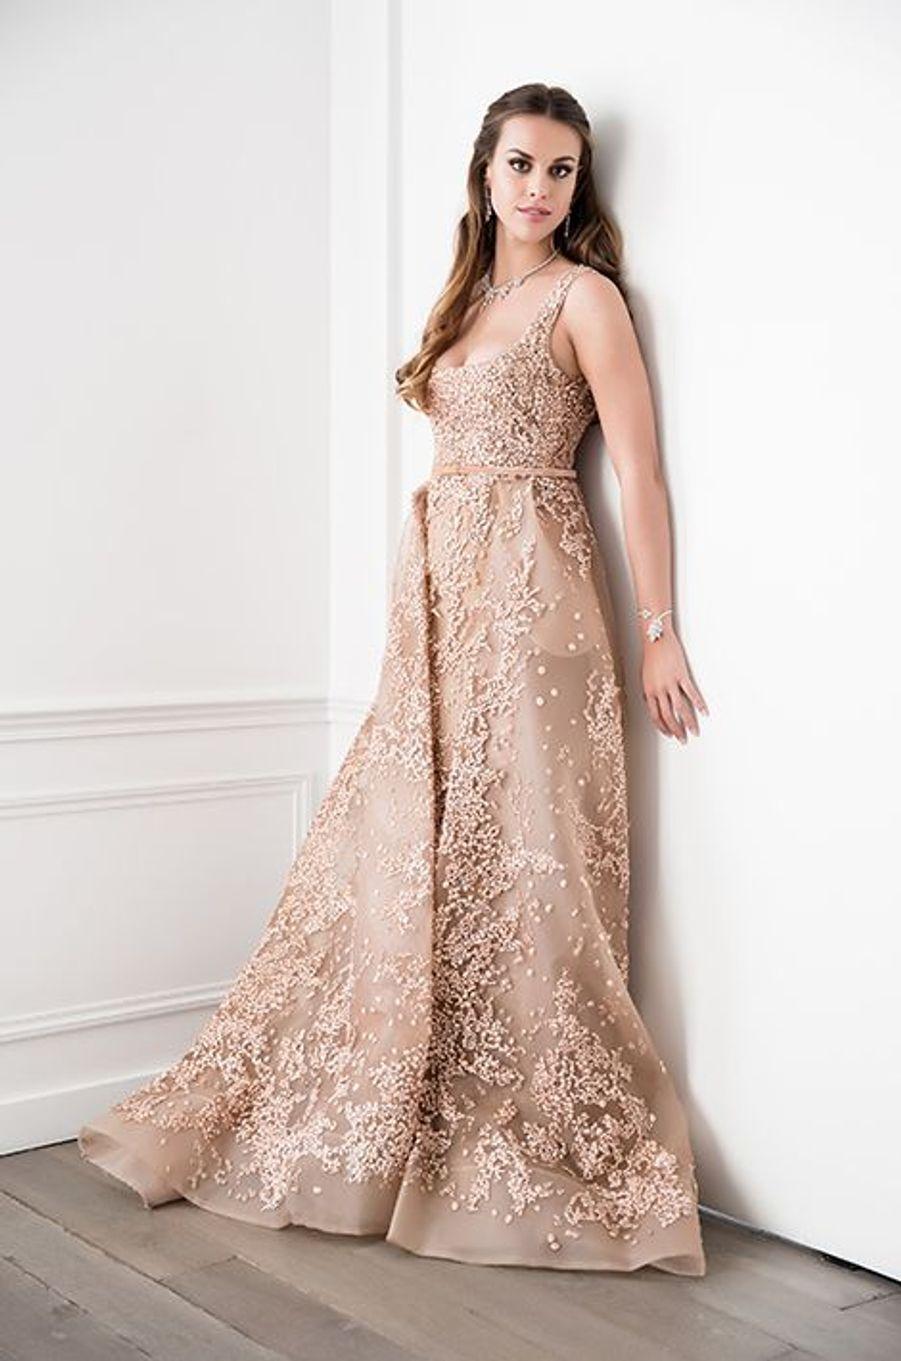 Inês de Bragança (Portugal) en robe Elie Saab Haute-Couture, bijoux Payal New York